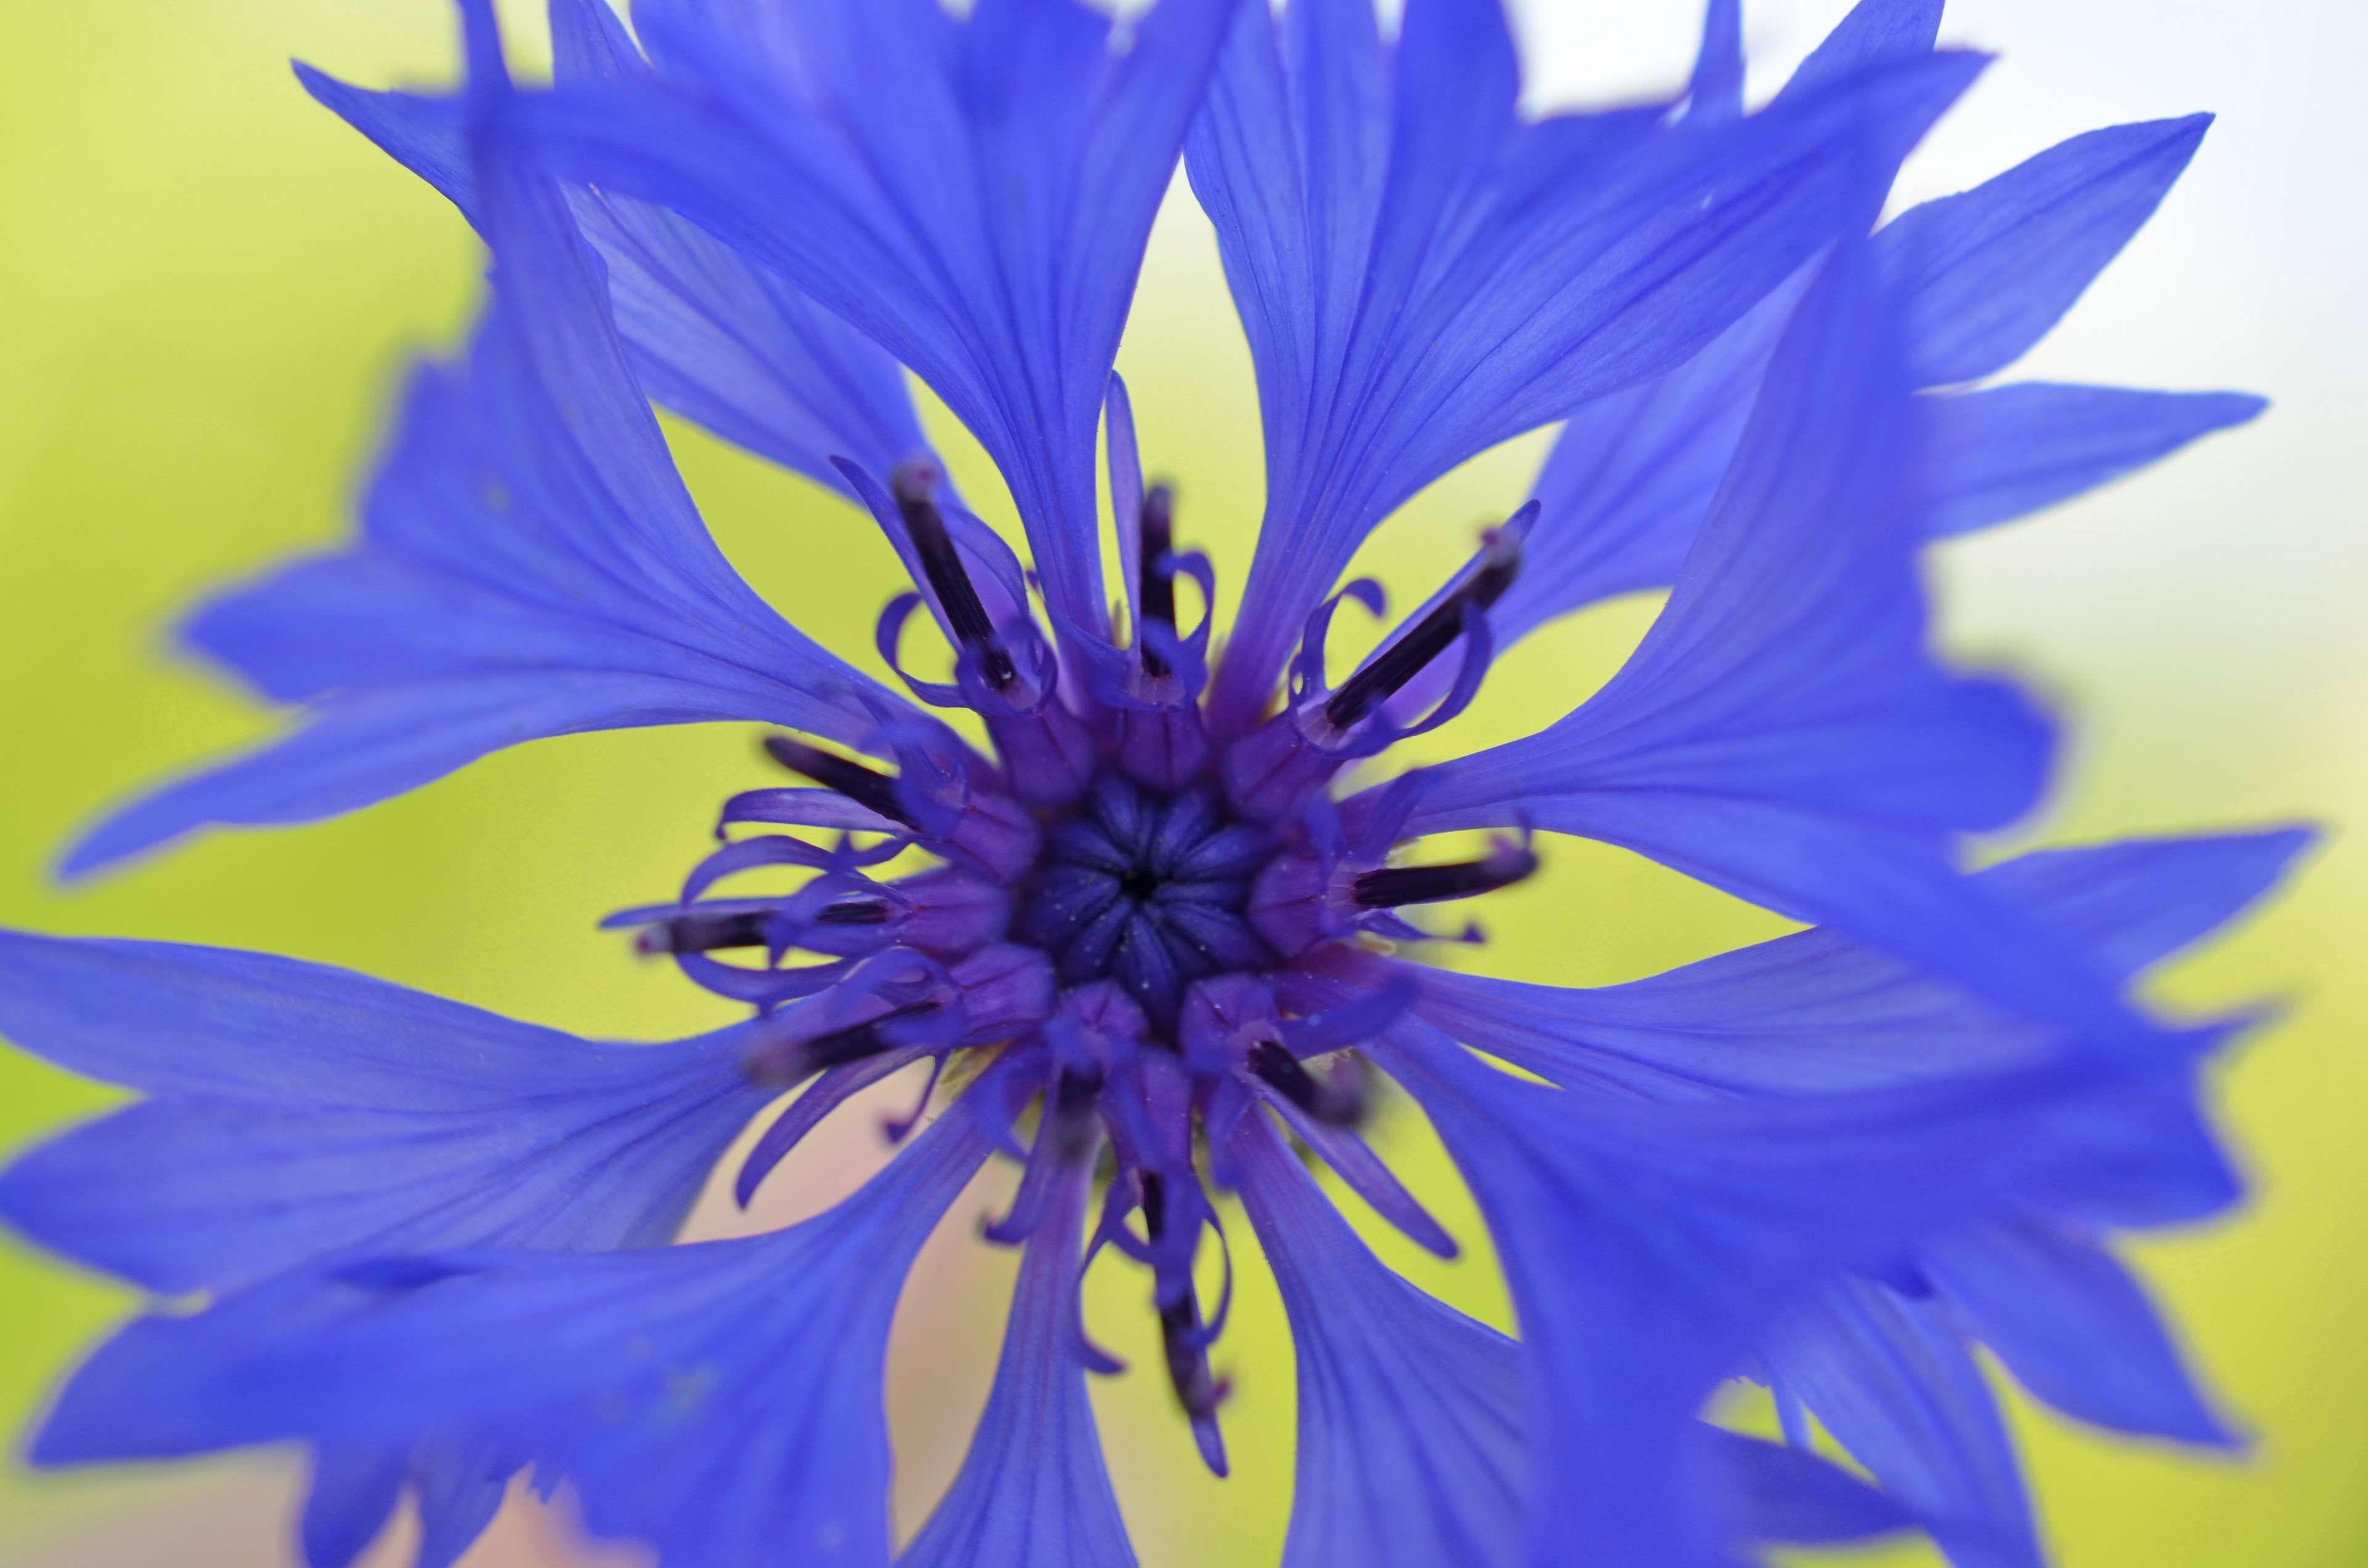 Bloom Blossom Blue Blue Violet Centaurea Cyanus Color Cornflower Flower Nature Plant Royalty F British Wild Flowers Flower Images Flower Images Free